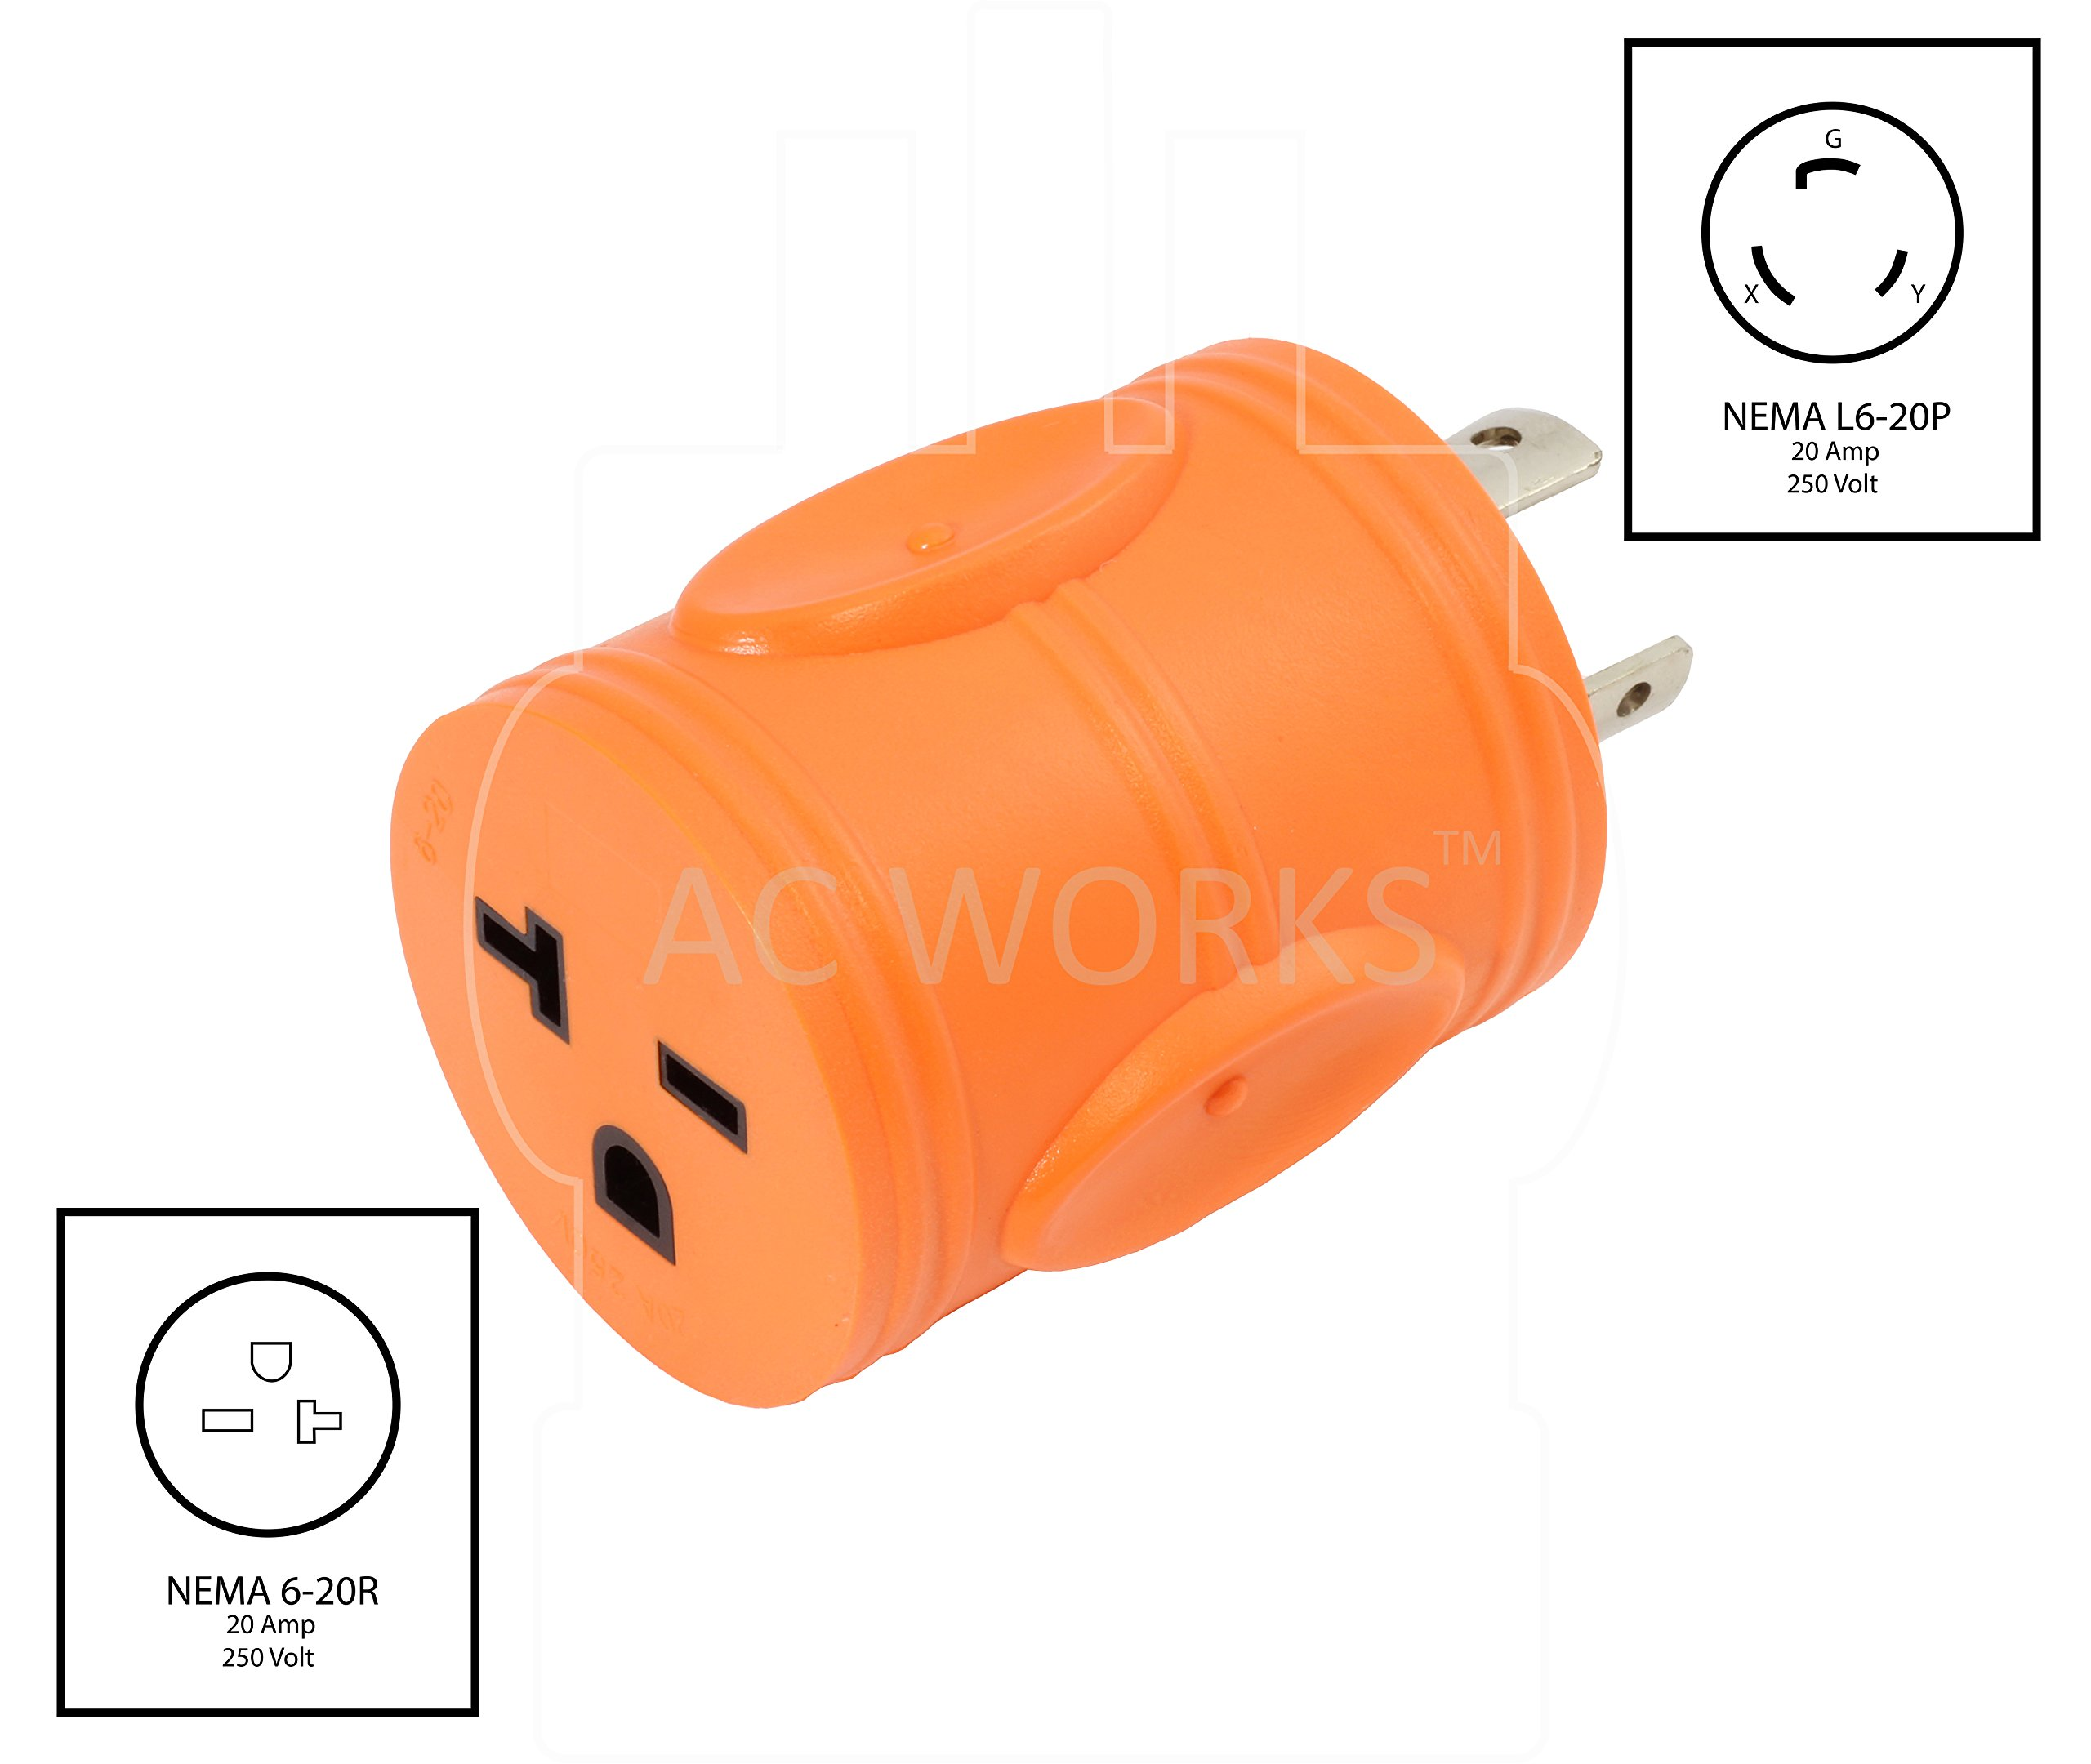 AC WORKS [ADL620620] NEMA L6-20P 20Amp 250Volt Locking Plug to NEMA 6-15/20R 15/20Amp 250Volt Female Connector Adapter by AC WORKS (Image #2)